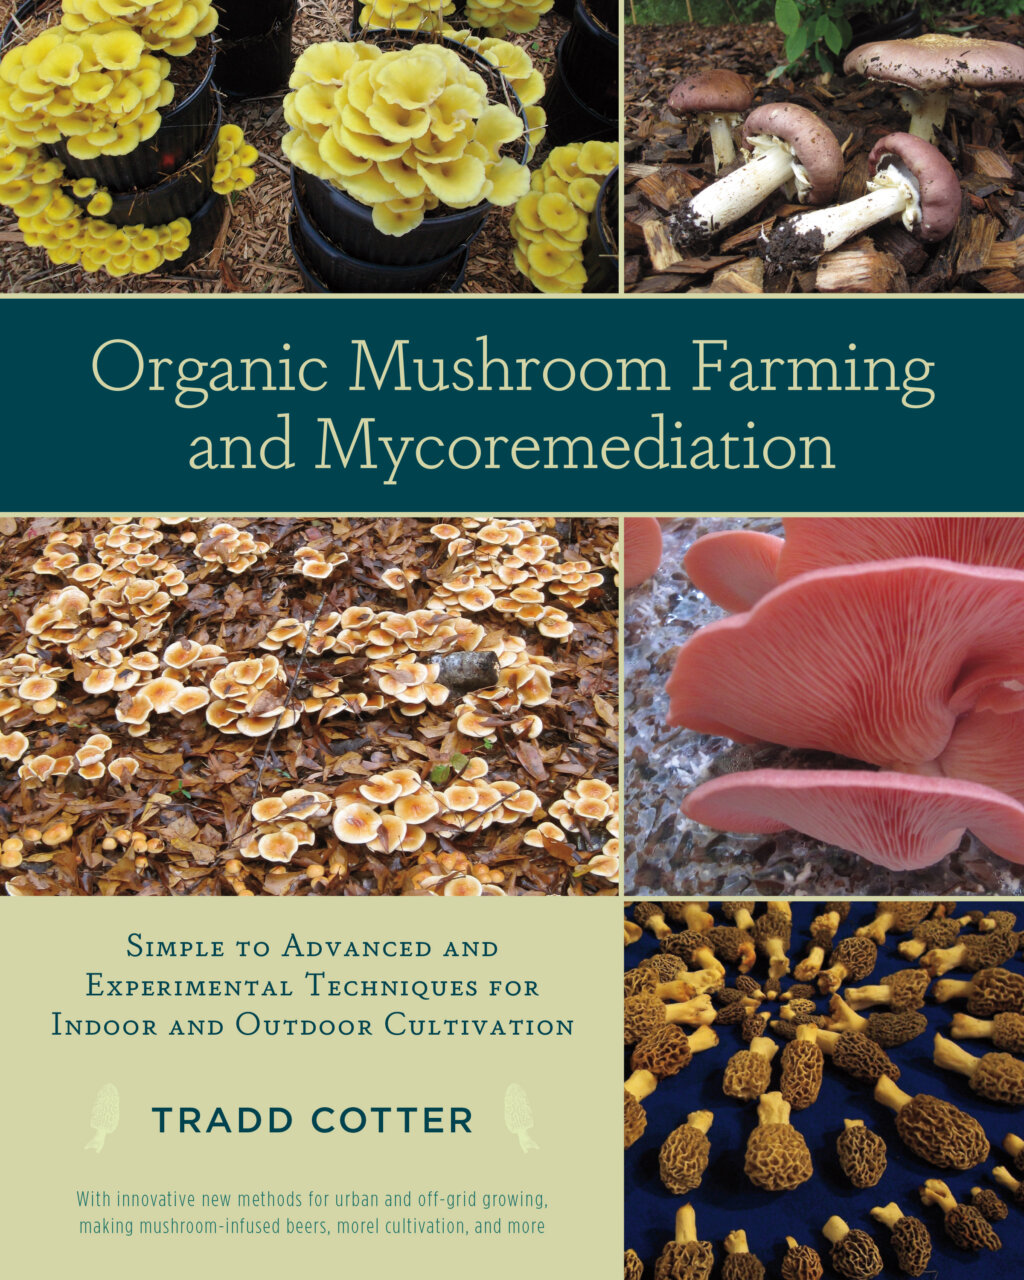 The Organic Mushroom Farming and Mycoremediation cover